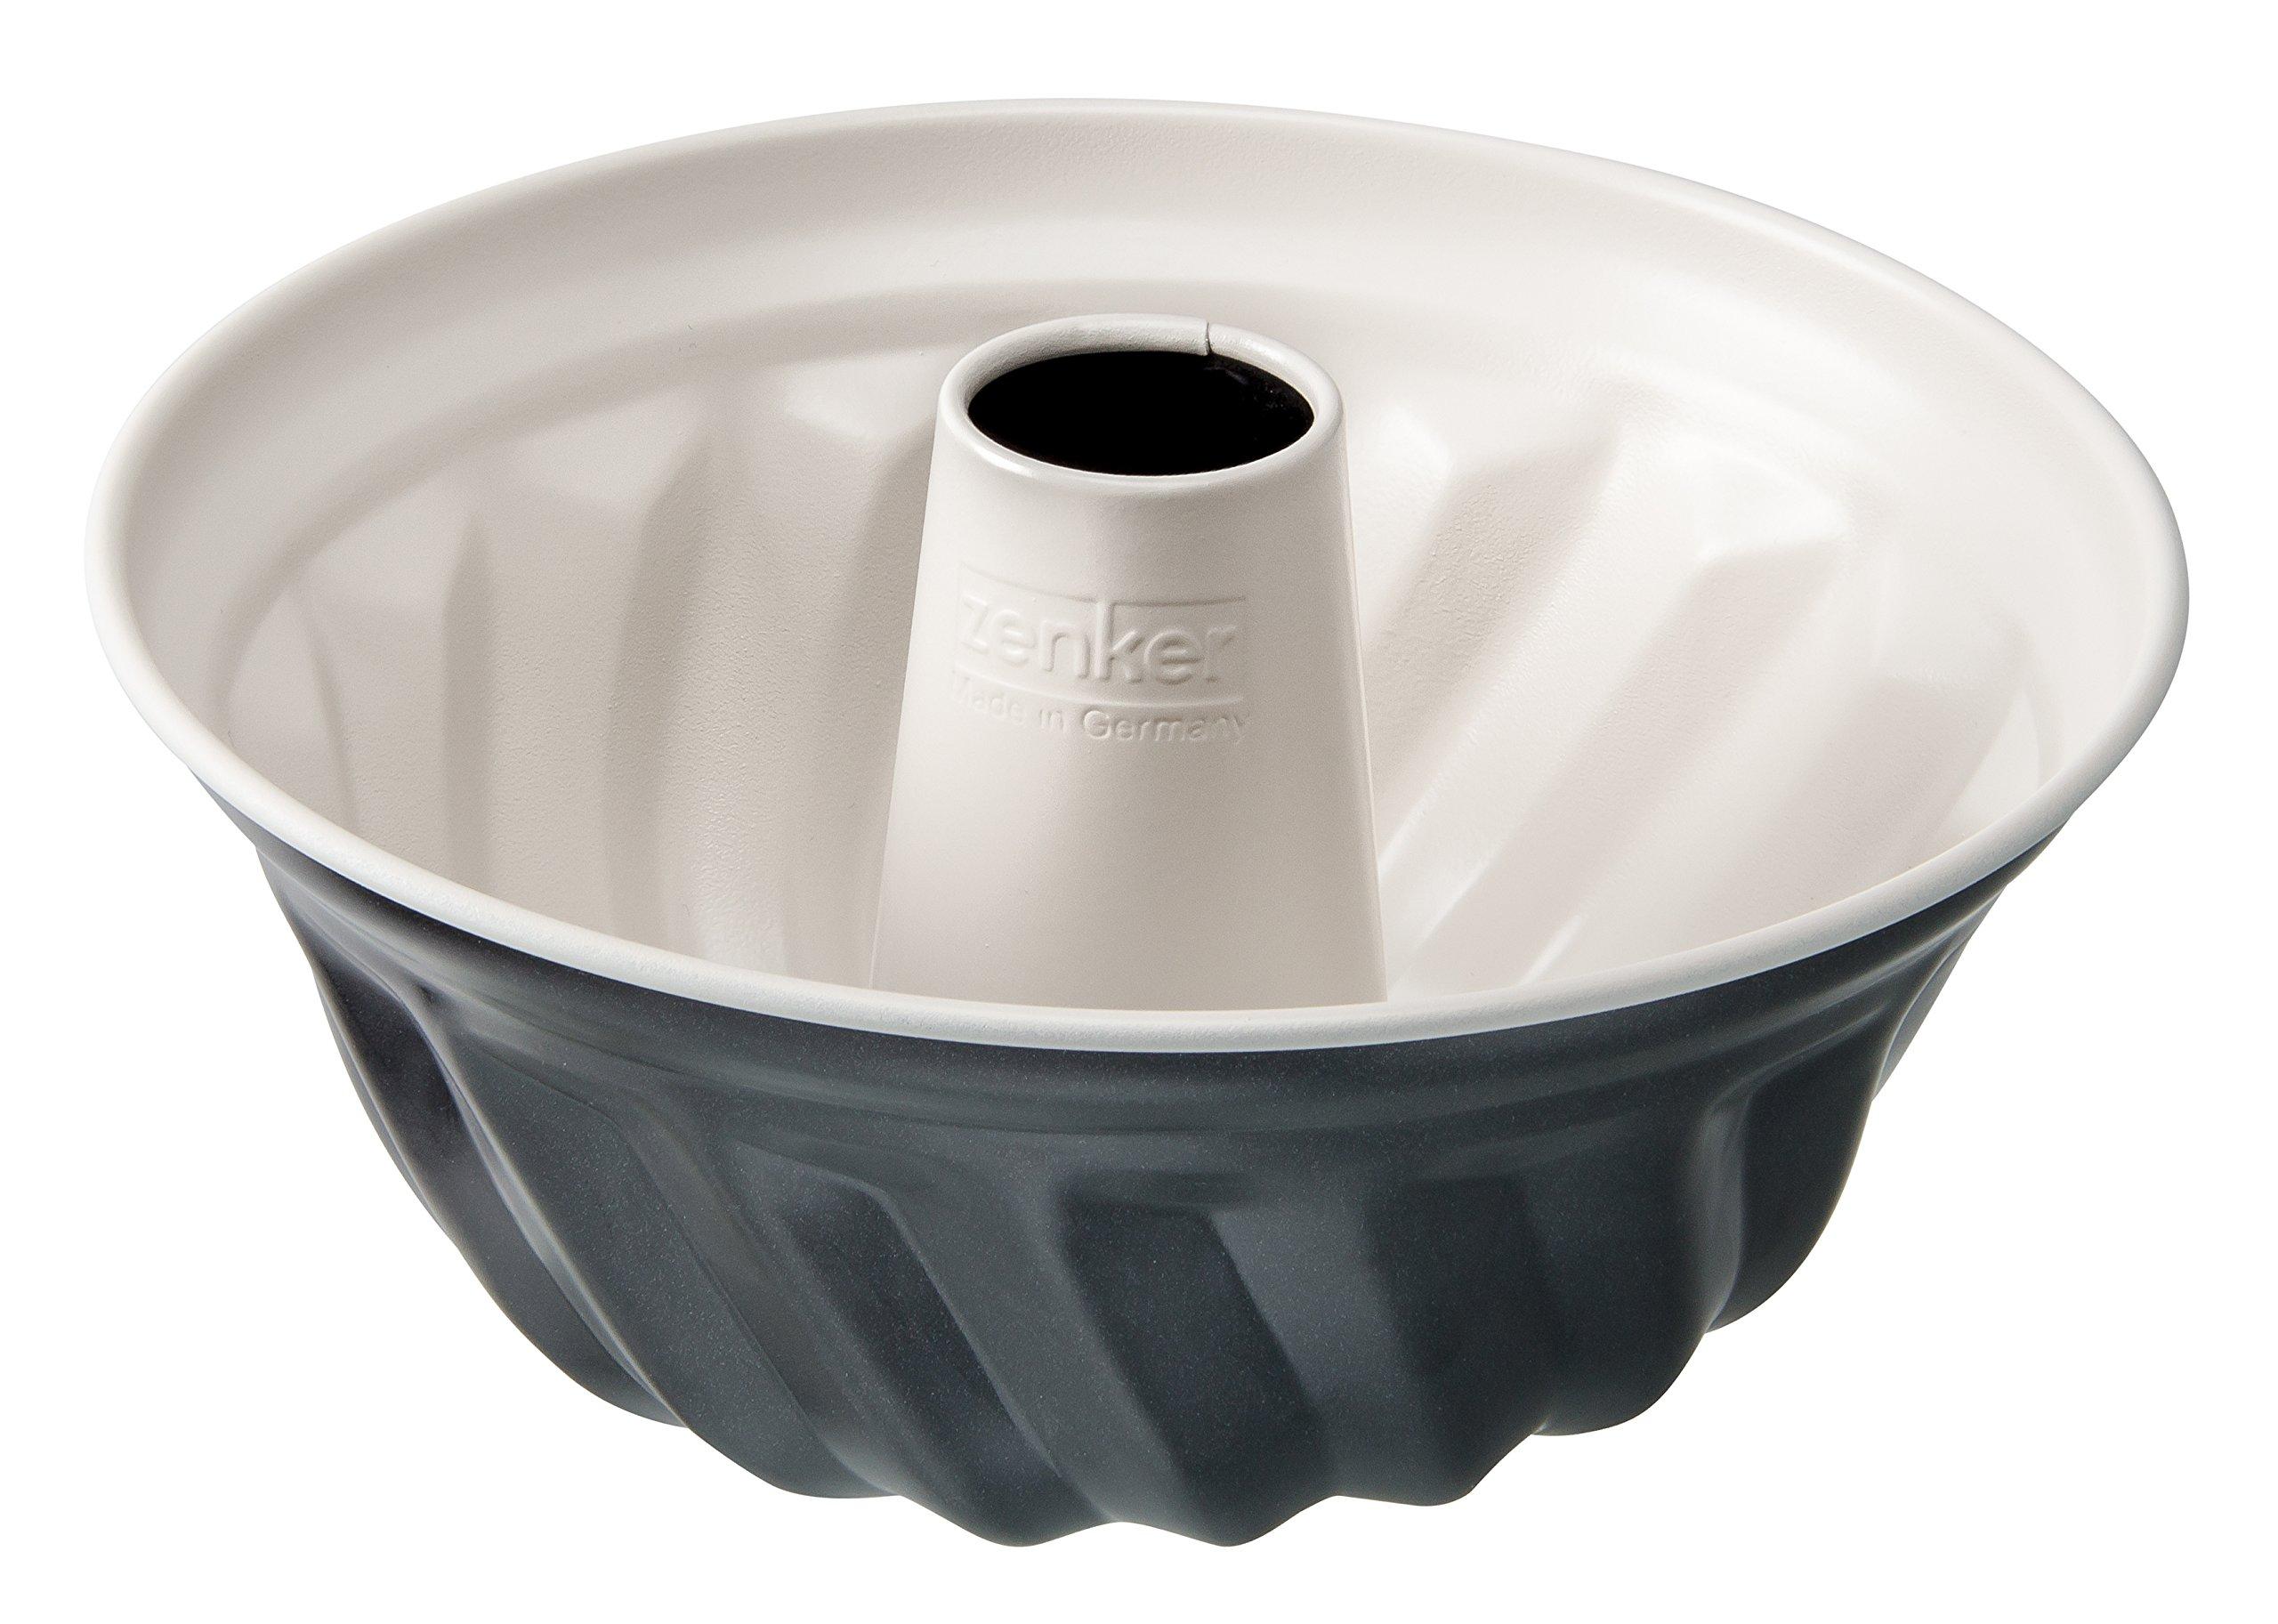 Zenker 7815 Kugelhopf Tin ''Creme Noir'', Grey/Beige, 8.66''